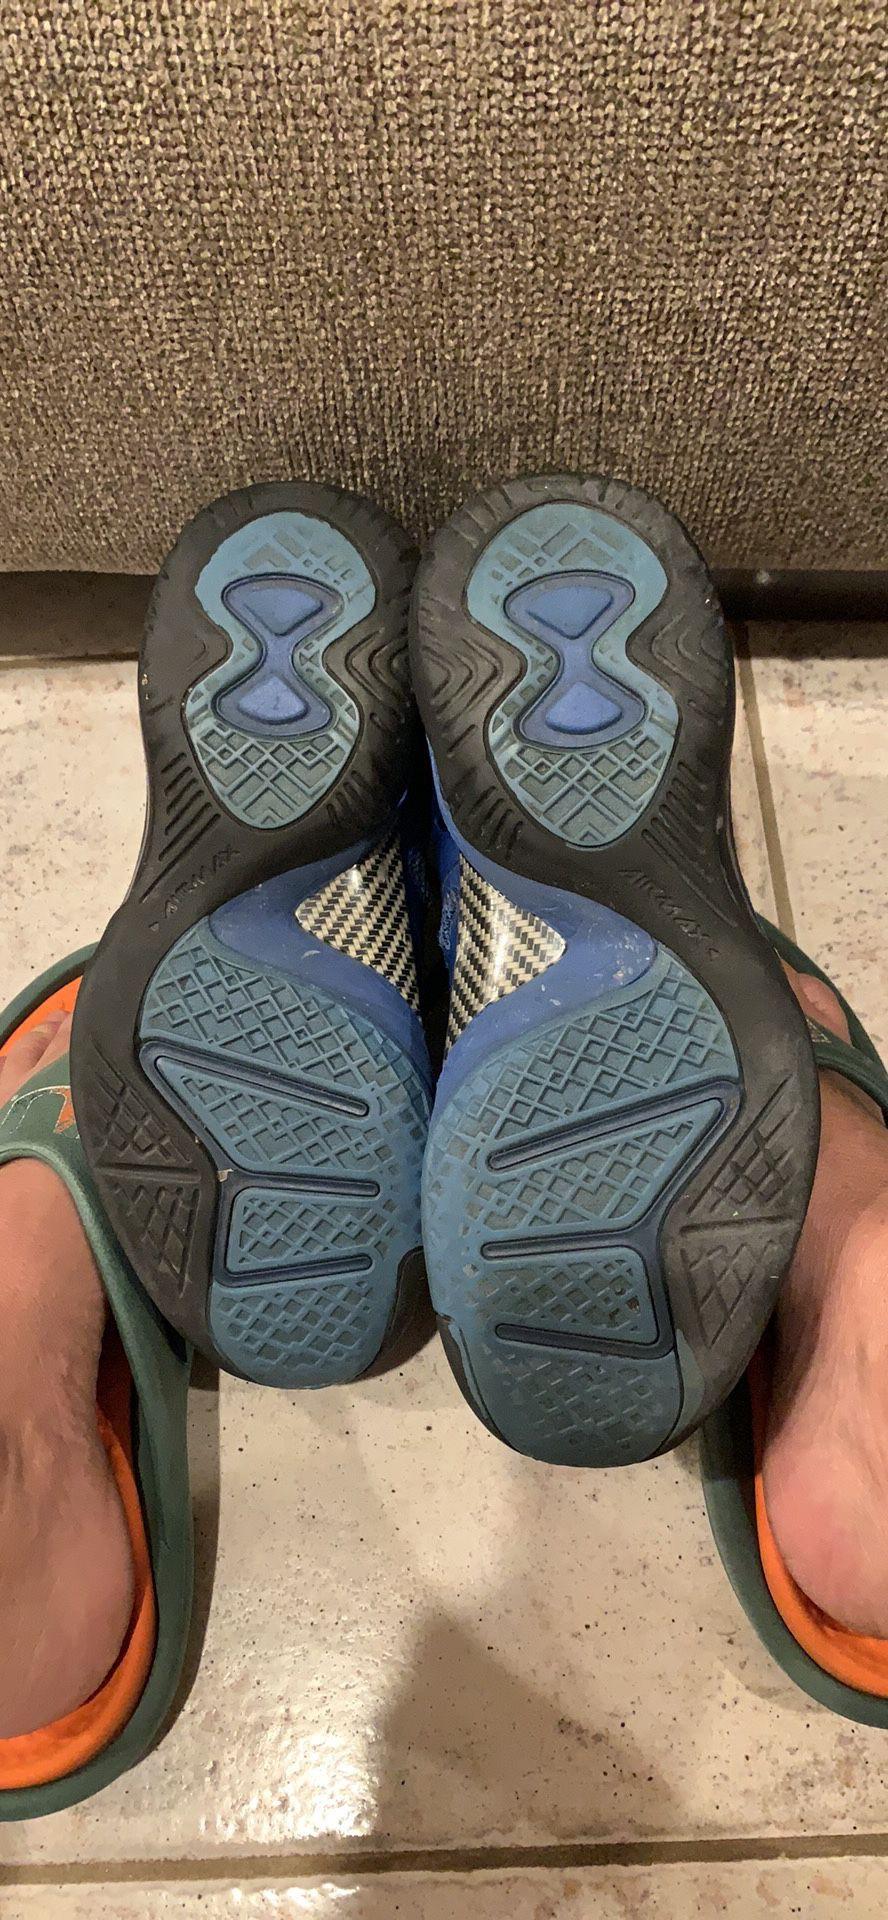 2 pairs Nike lebron James hi top sneakers. Size 6